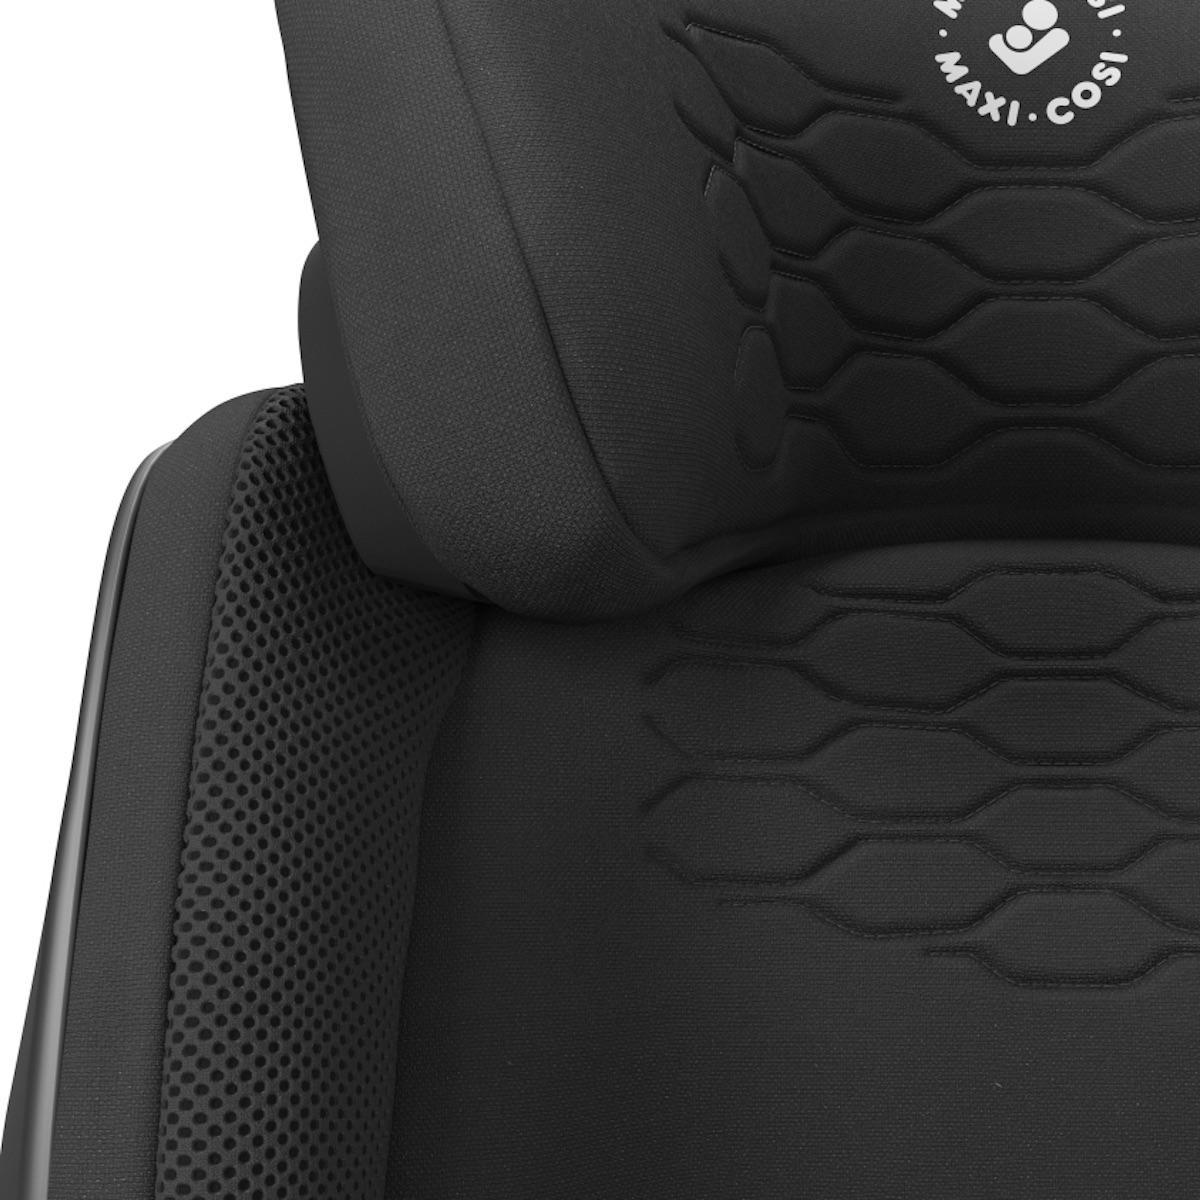 Siège auto gr2/3 KORE PRO I-SIZE Maxi-Cosi Authentic Black